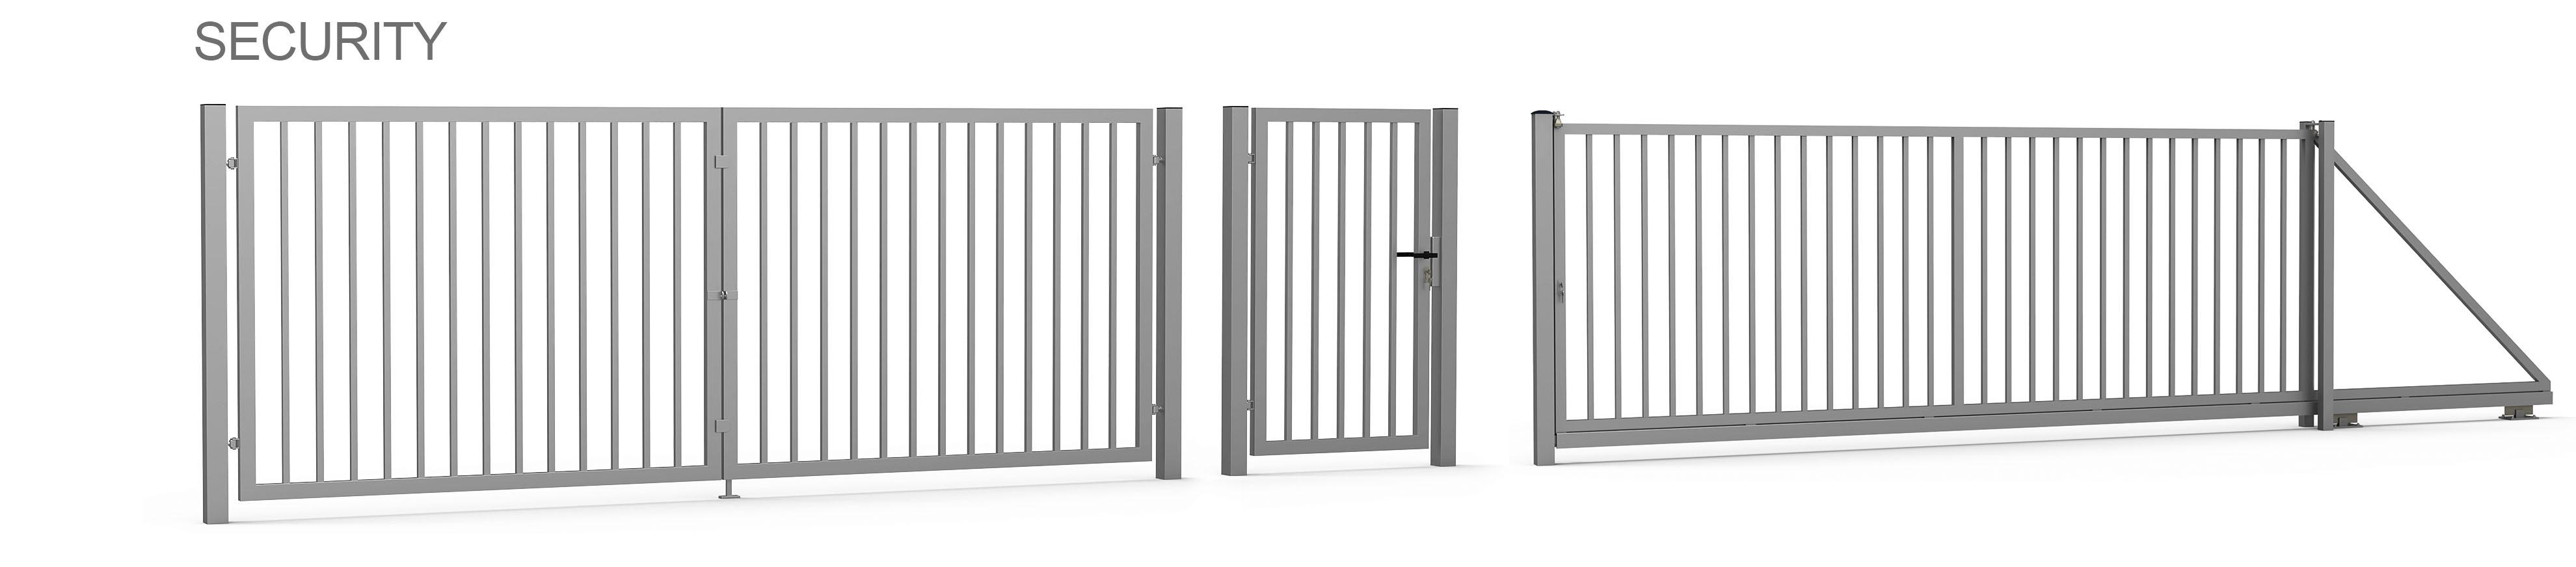 Grindar Security